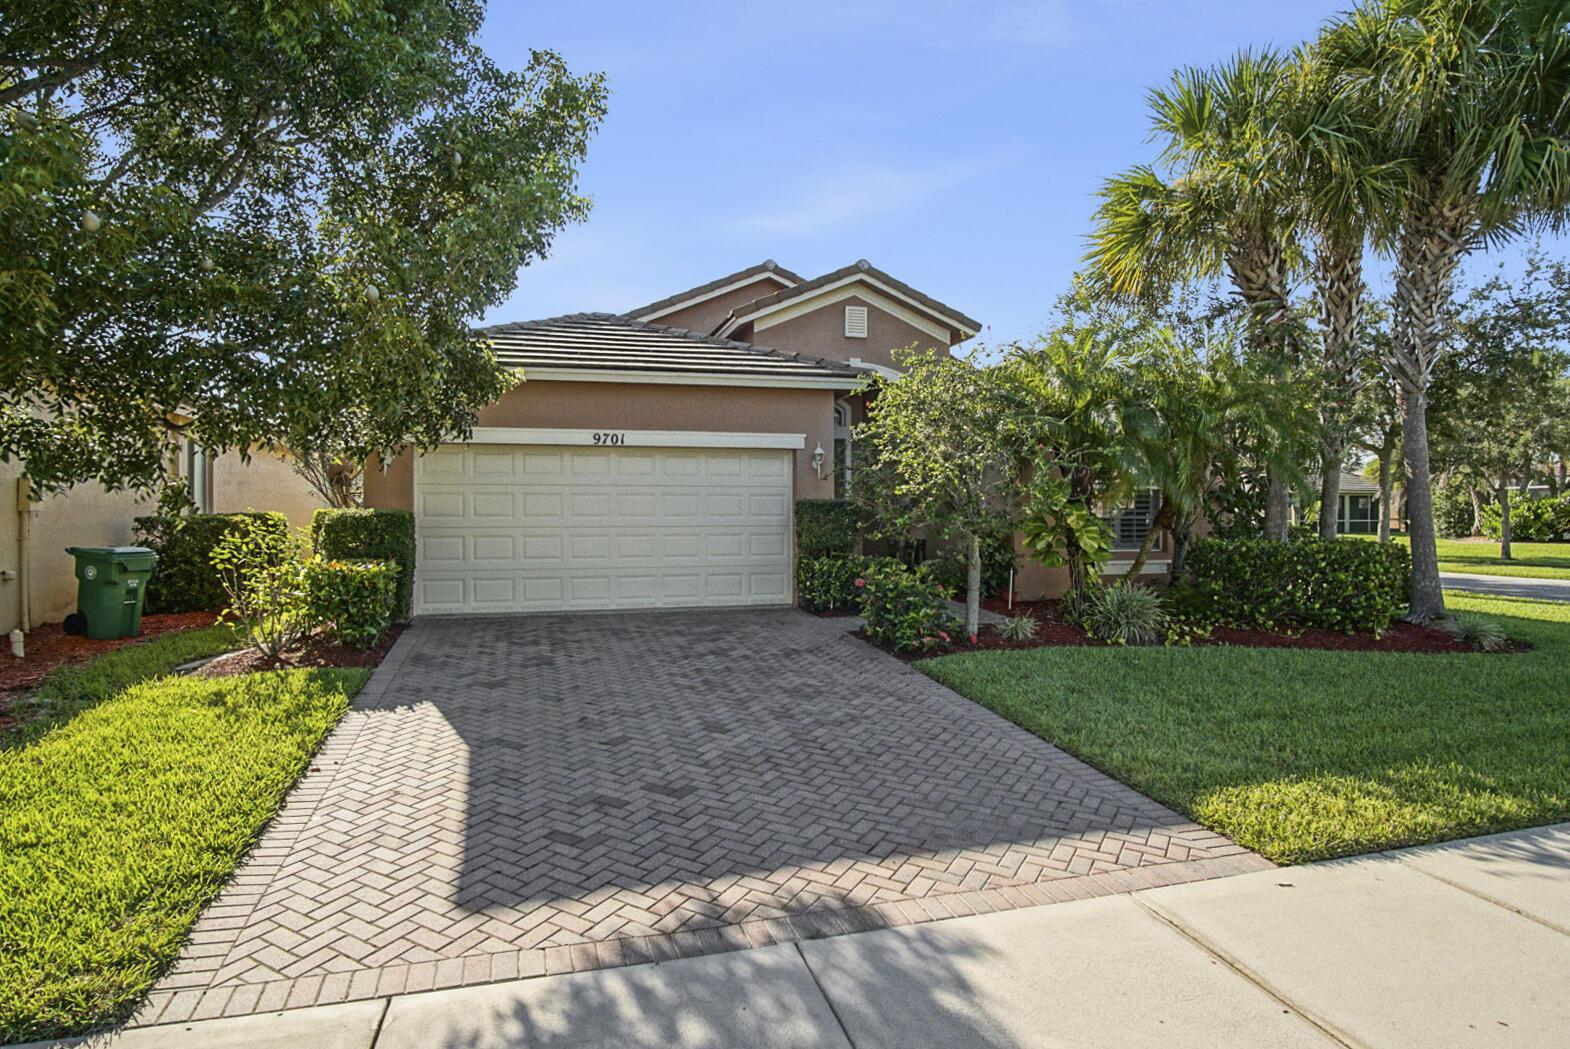 9701 SW Glenbrook Drive - 34987 - FL - Port Saint Lucie